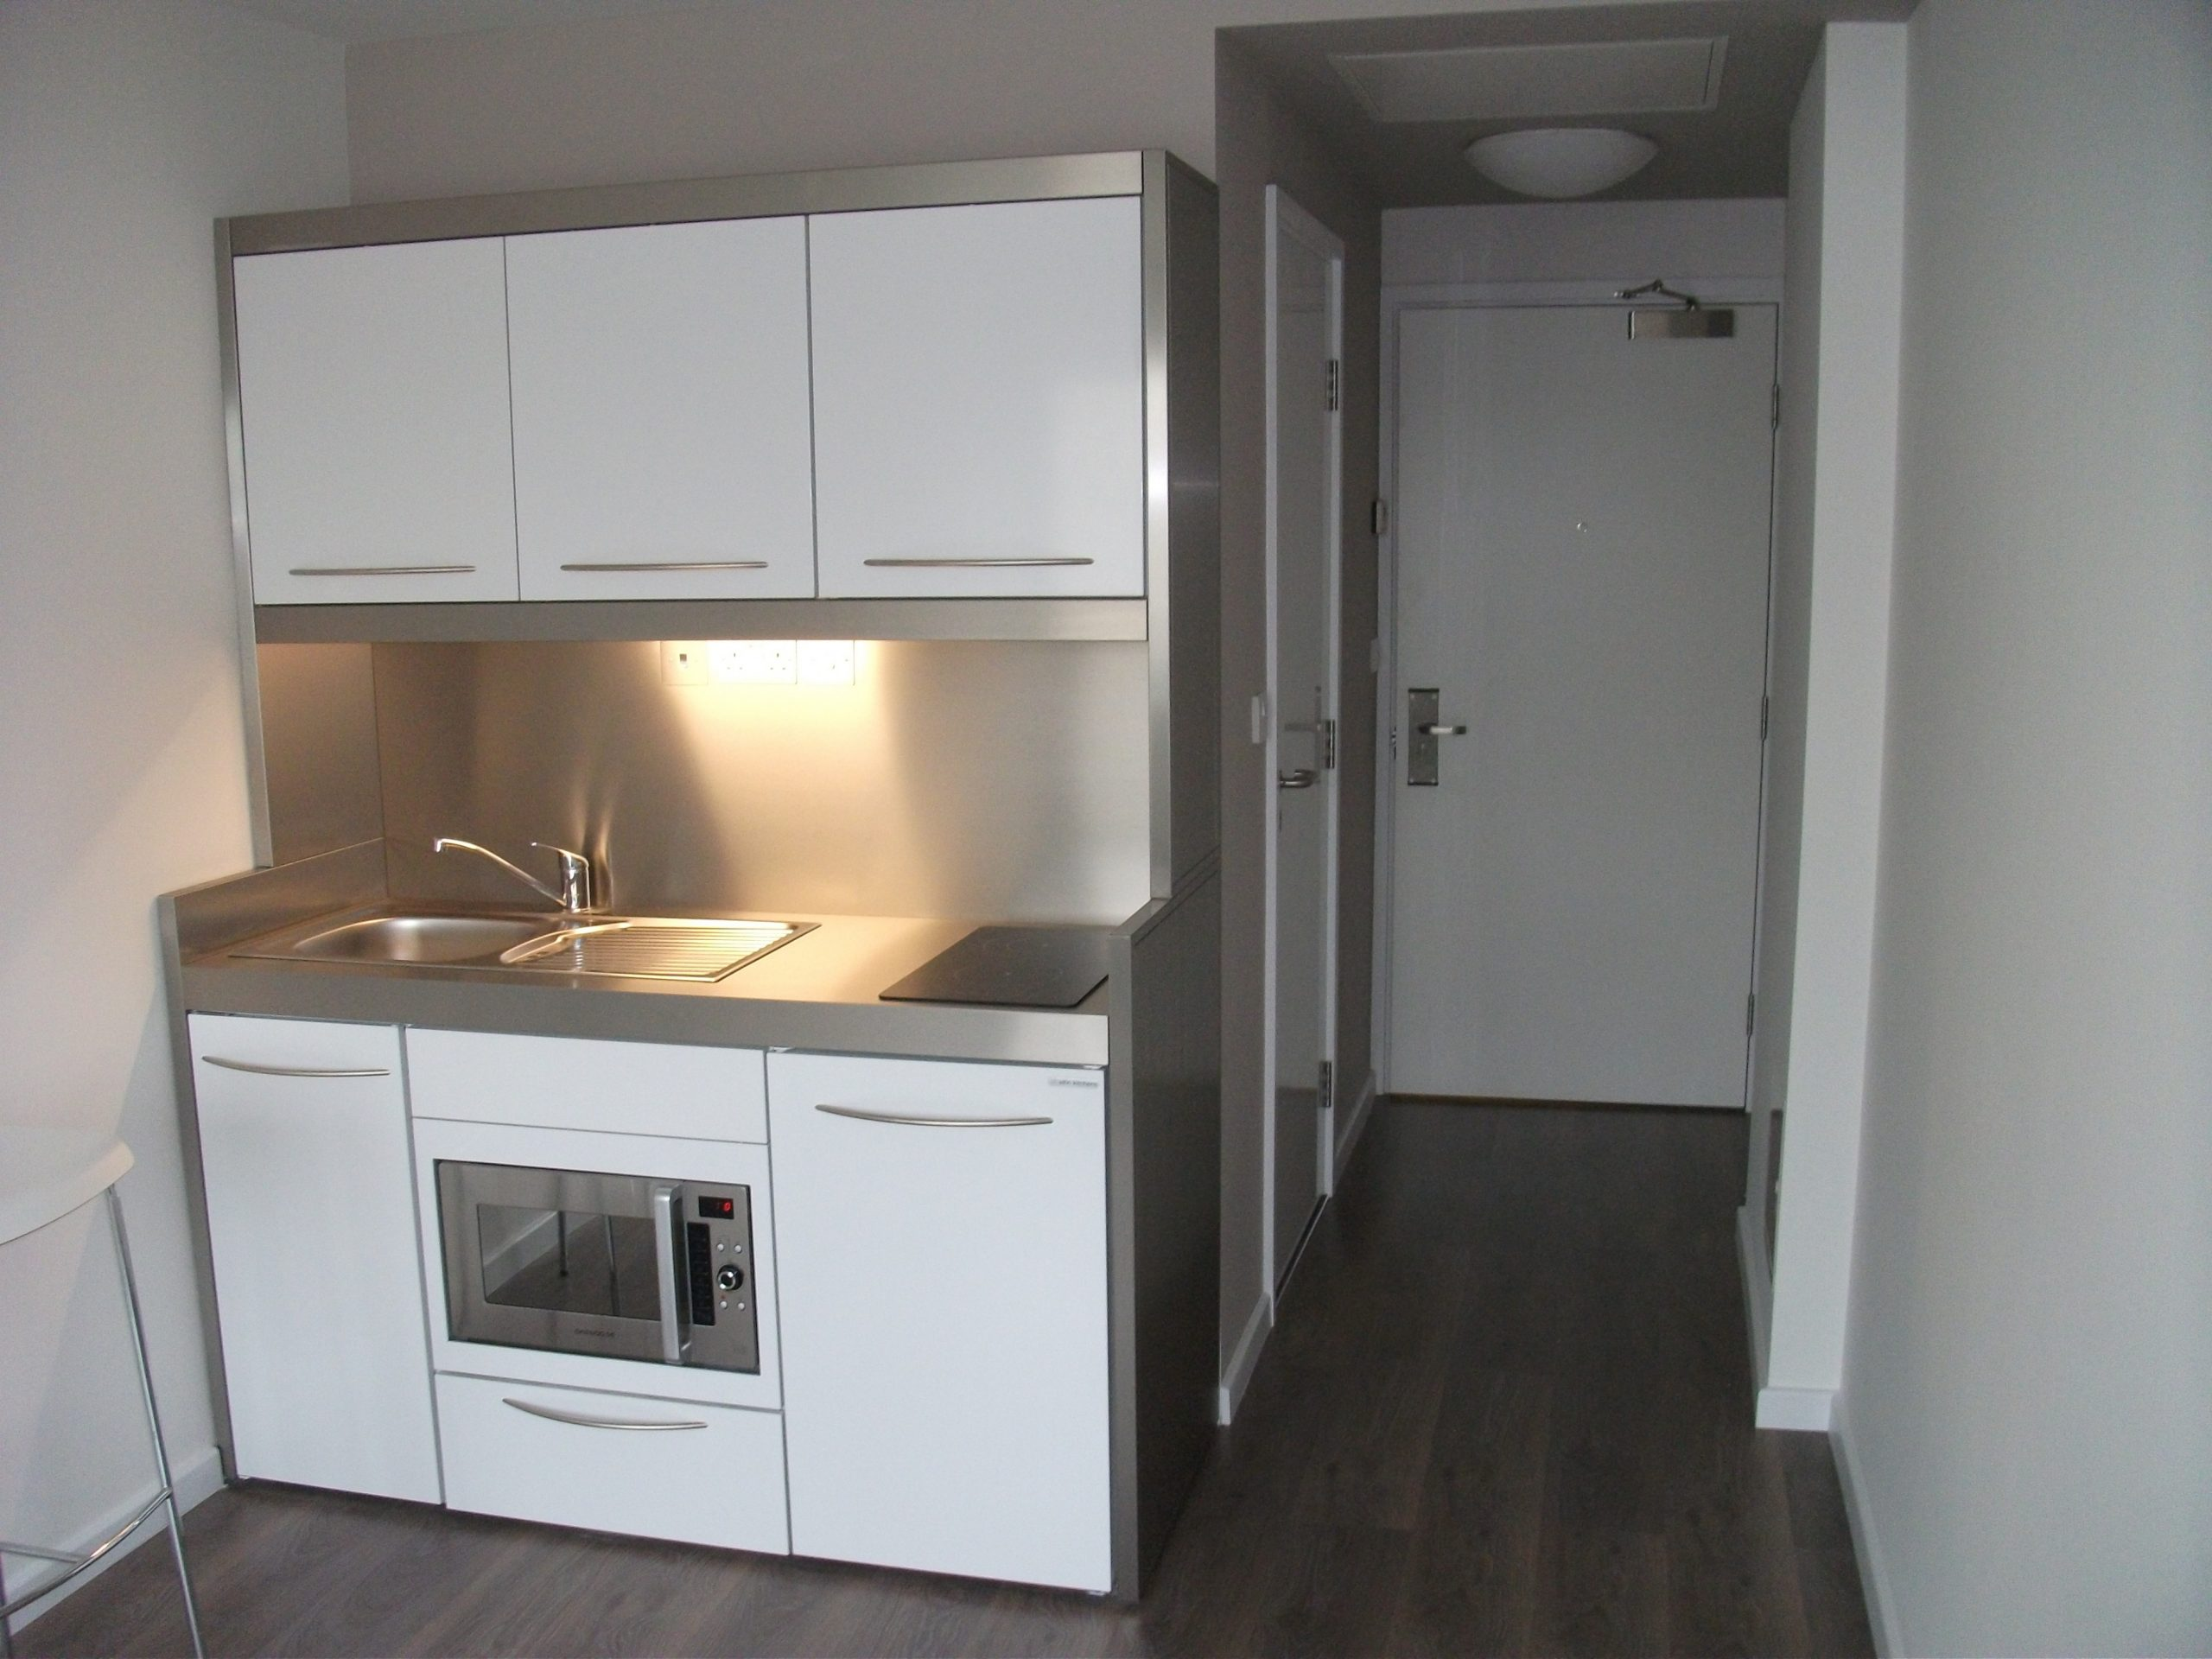 Kitchen Studio Apartment Kitchens Ideas Pictures Bathroom Bedroom  - Bedroom Kitchenette Ideas